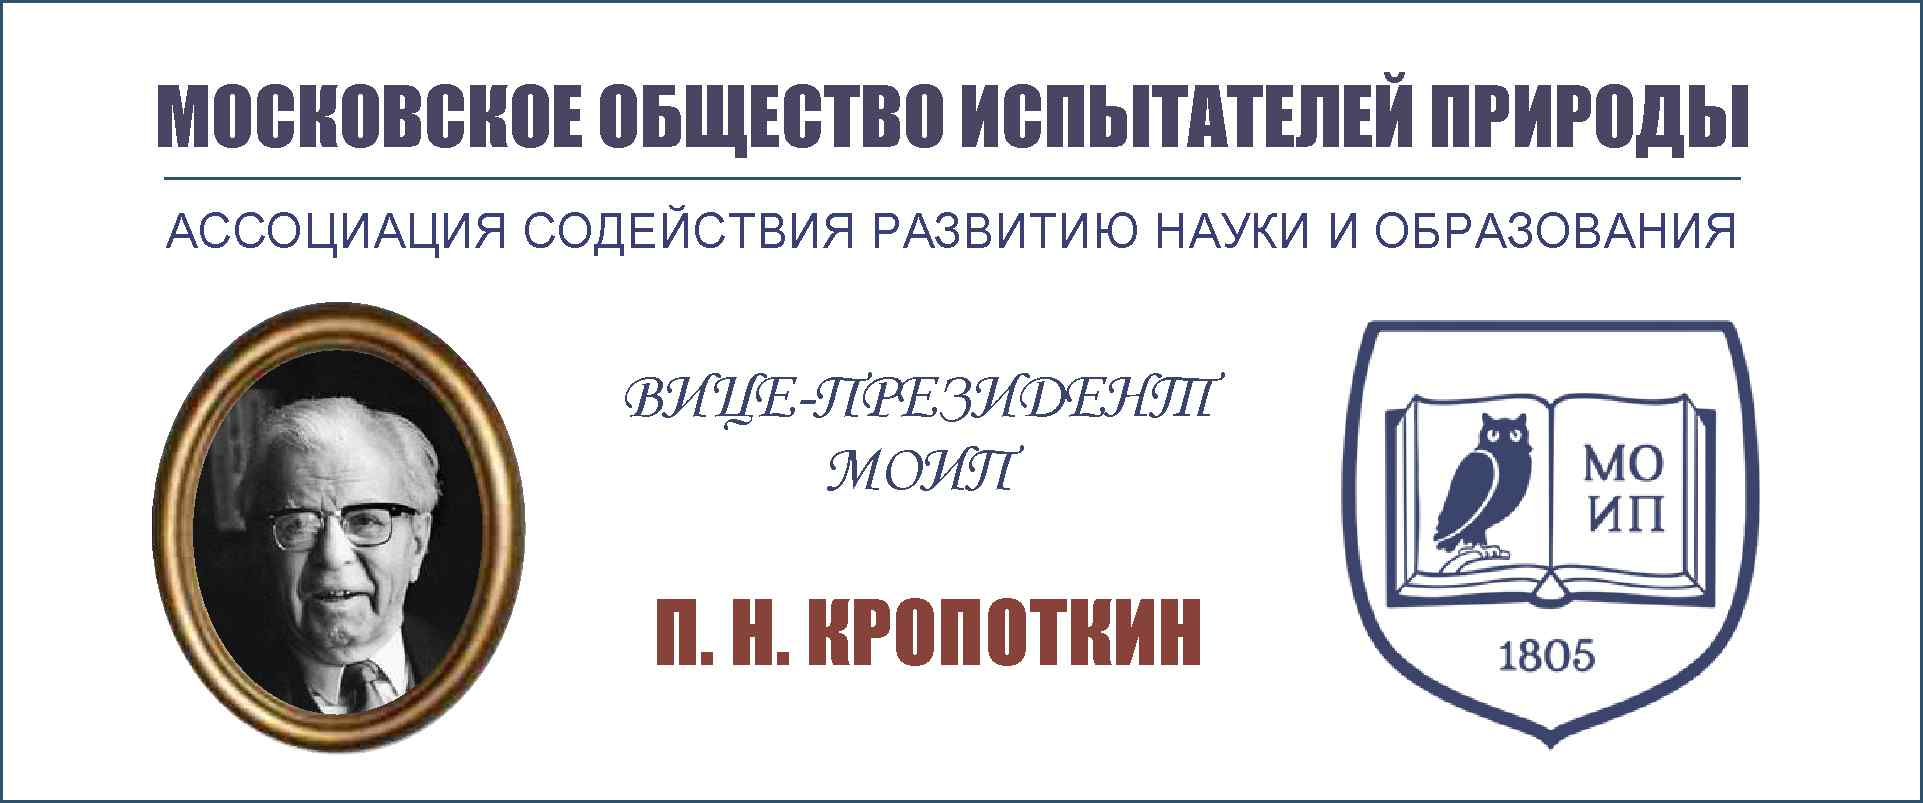 ВНУК  П.А.КРОПОТКИНА – ВИЦЕ-ПРЕЗИДЕНТ МОИП